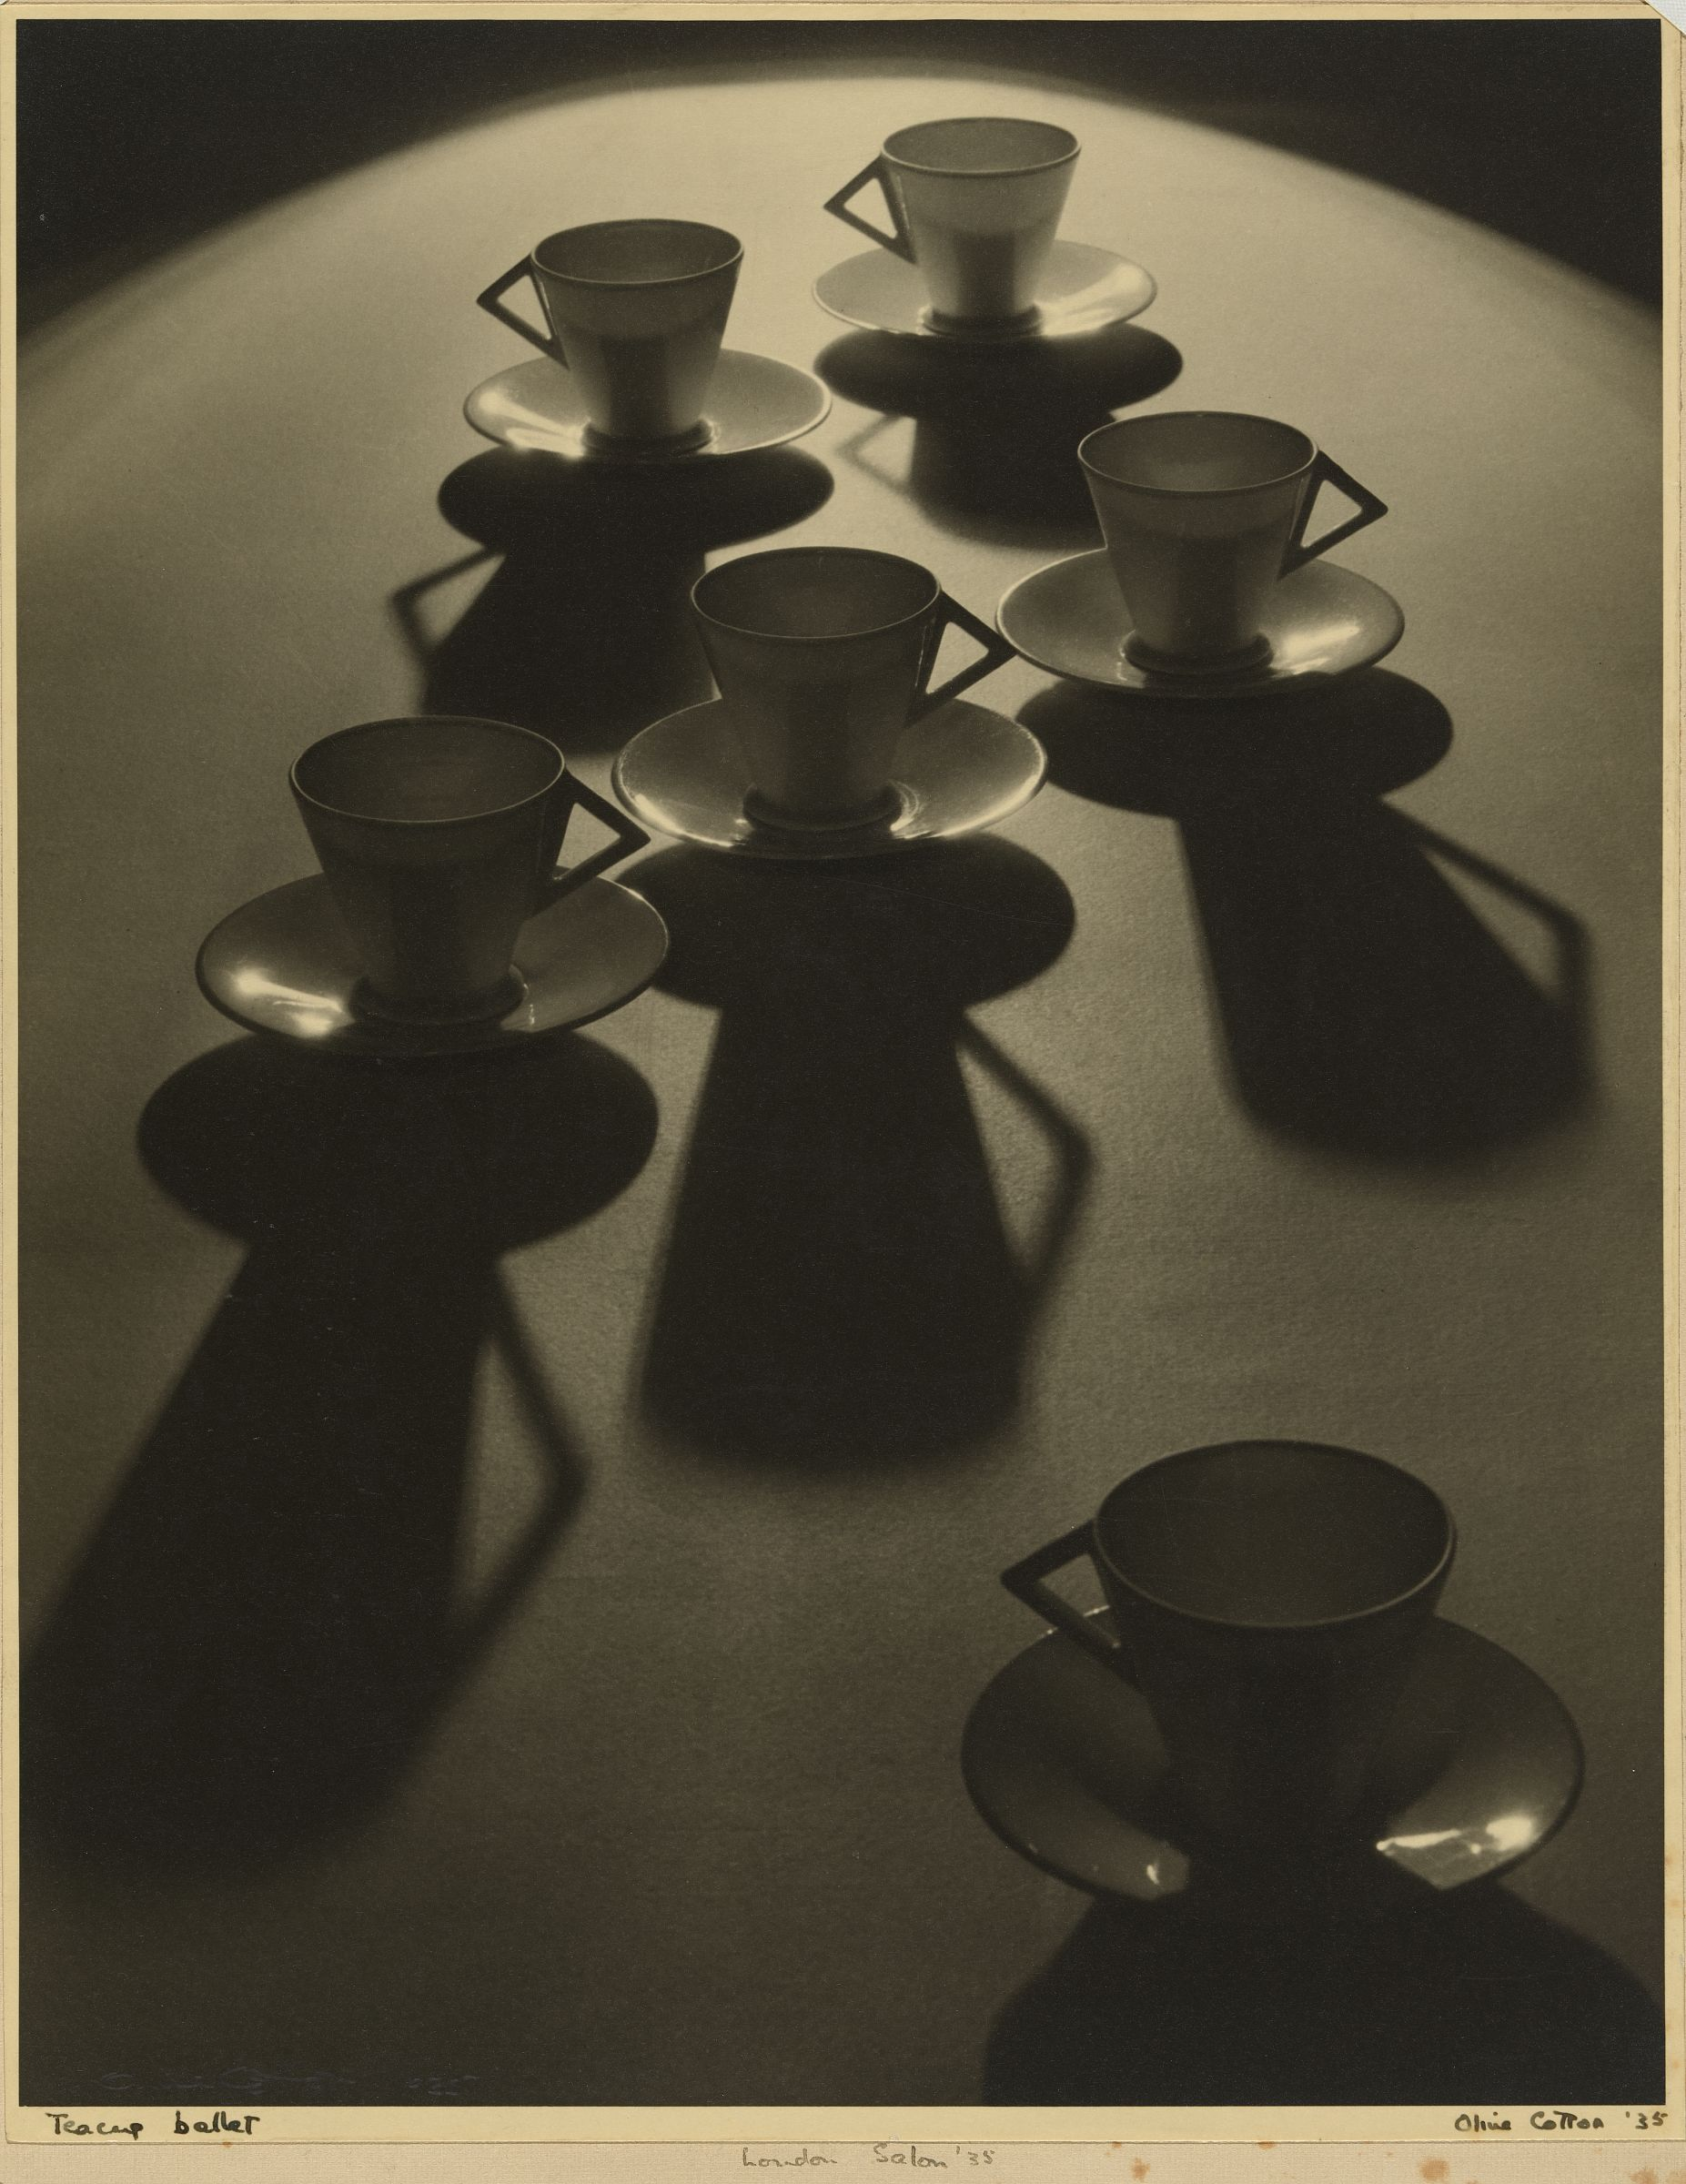 Teacup ballet 1935